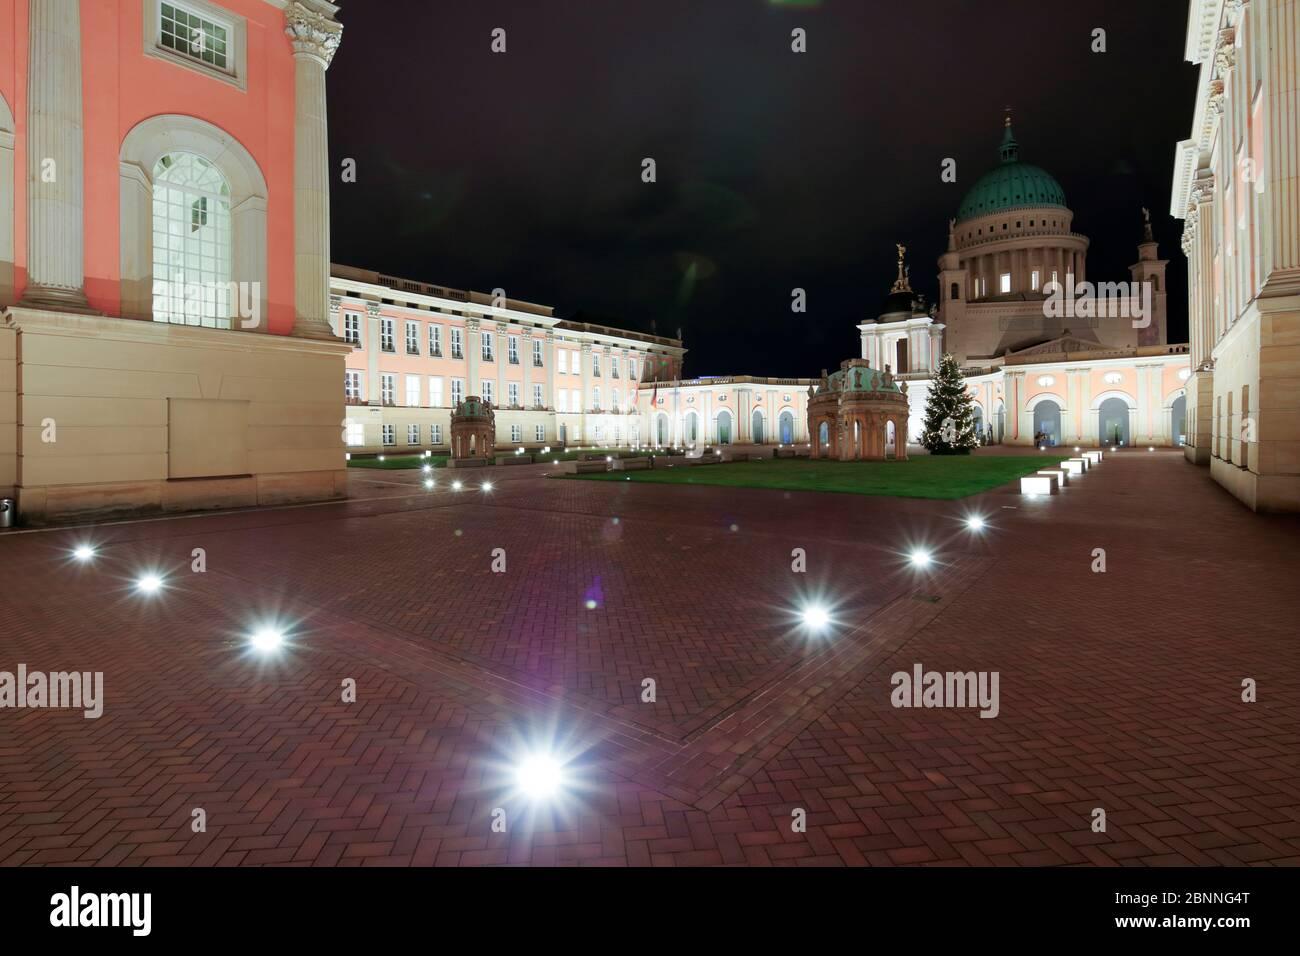 City Palace, State Government, Inner Court, Blue Hour, Nikolaikirche, Potsdam, Brandenburg, Germany, Europe Stock Photo